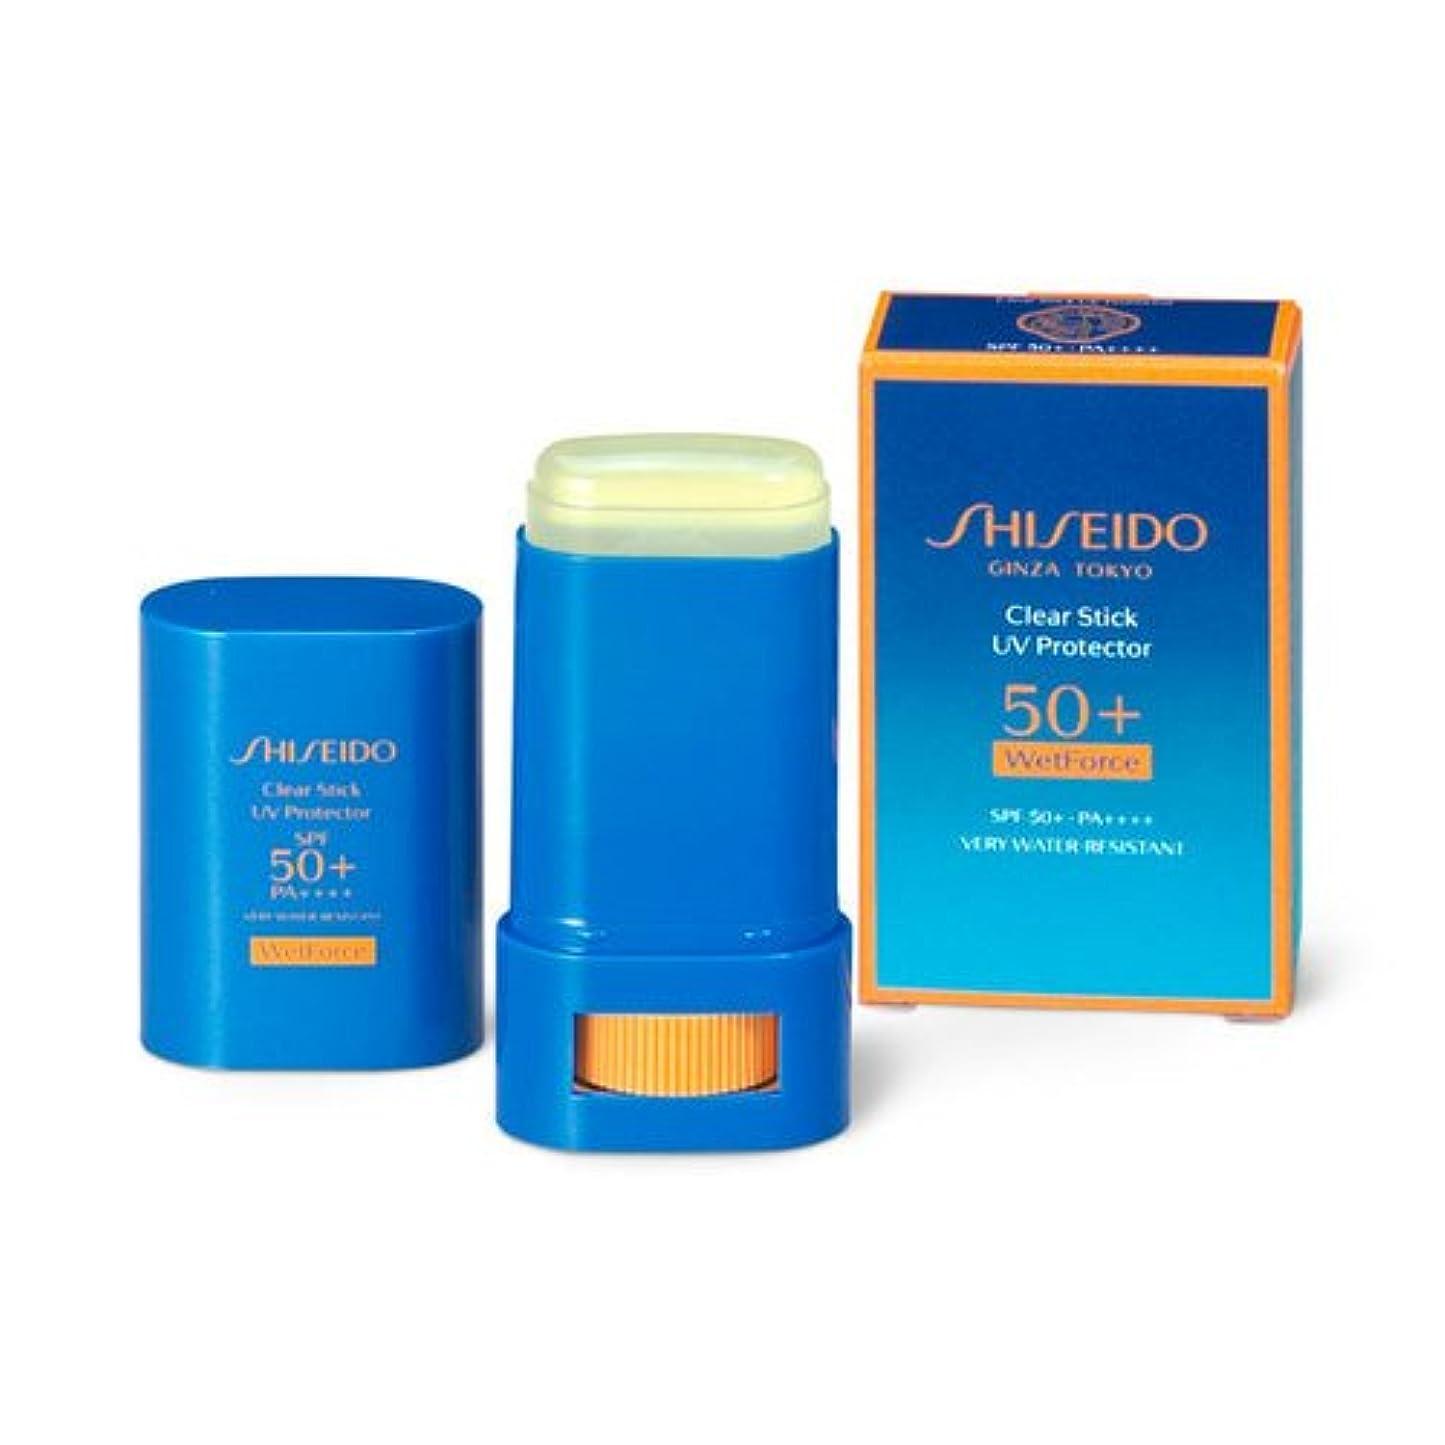 SHISEIDO Suncare(資生堂 サンケア) SHISEIDO(資生堂) クリアスティック UVプロテクター 15g